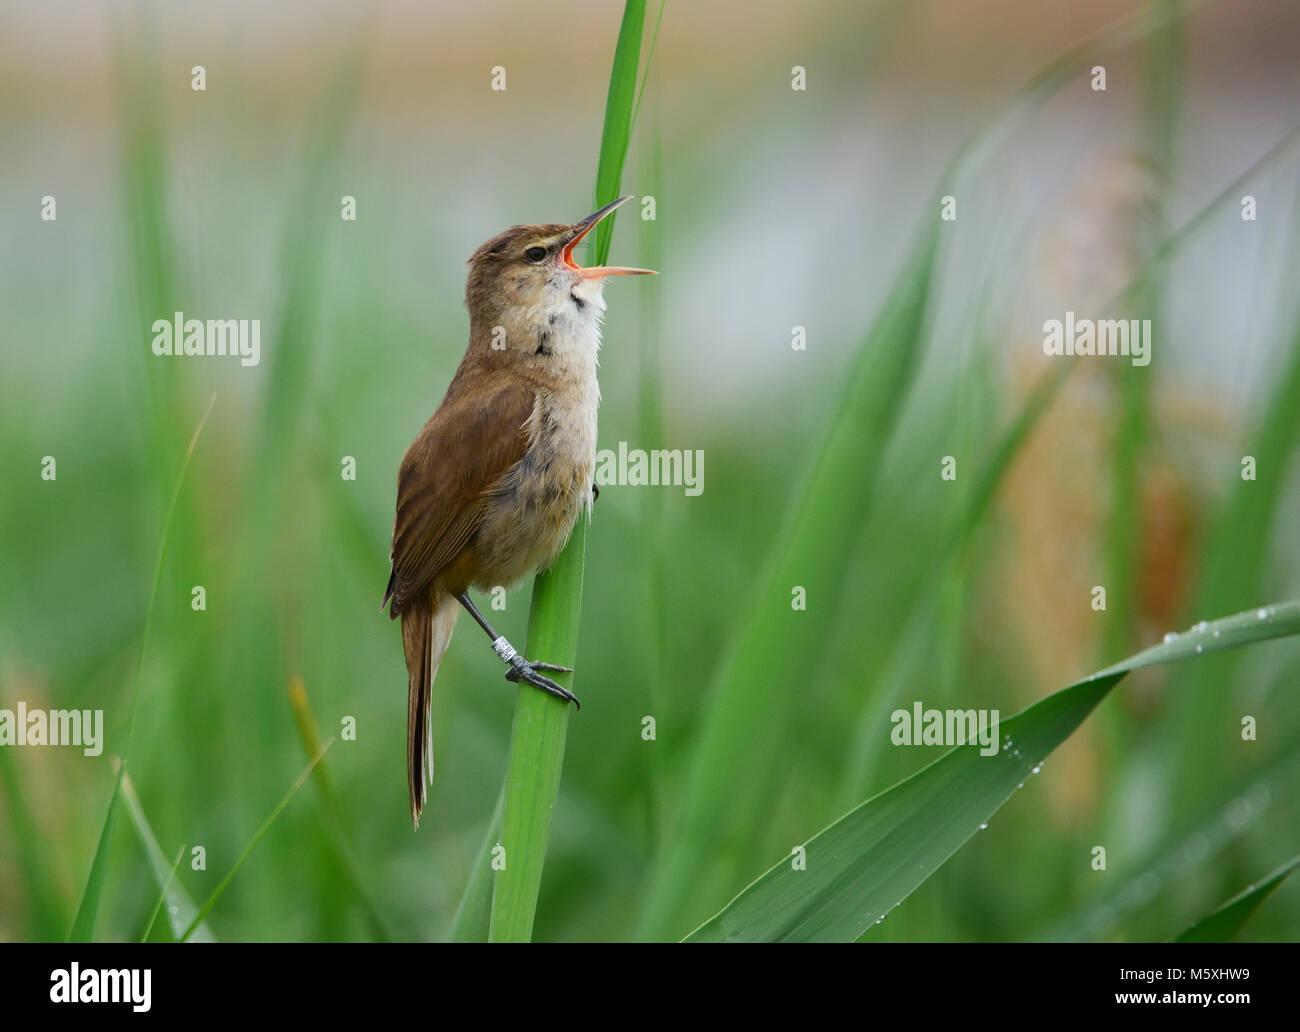 Ringed Acrocephalus warbler sings - Stock Image